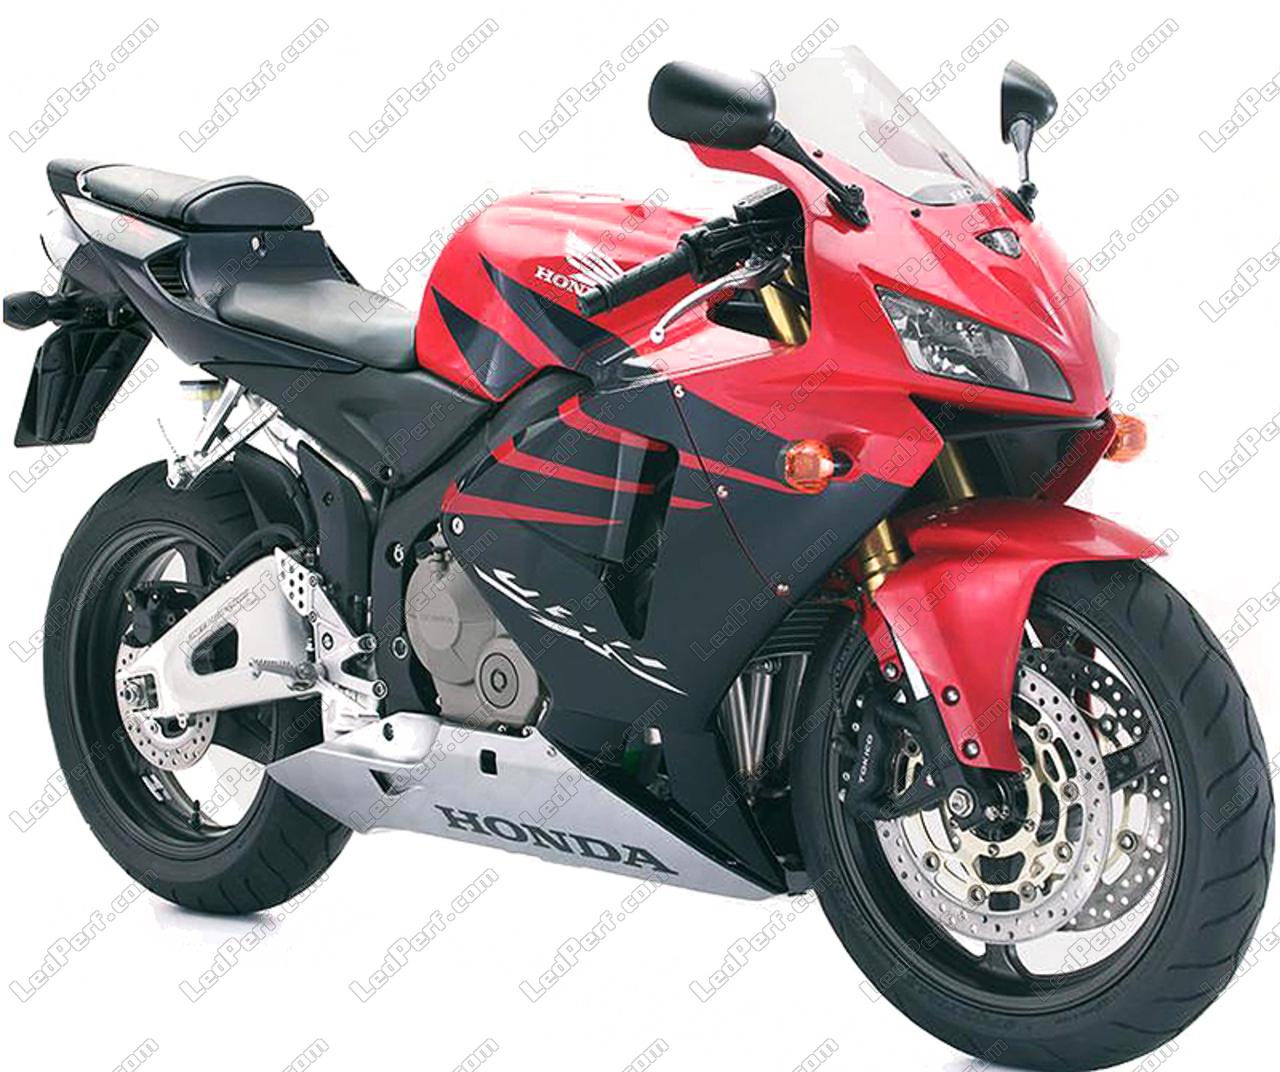 2005 Honda CBR 600 RR 3700 miles,Upgrades - LS1TECH